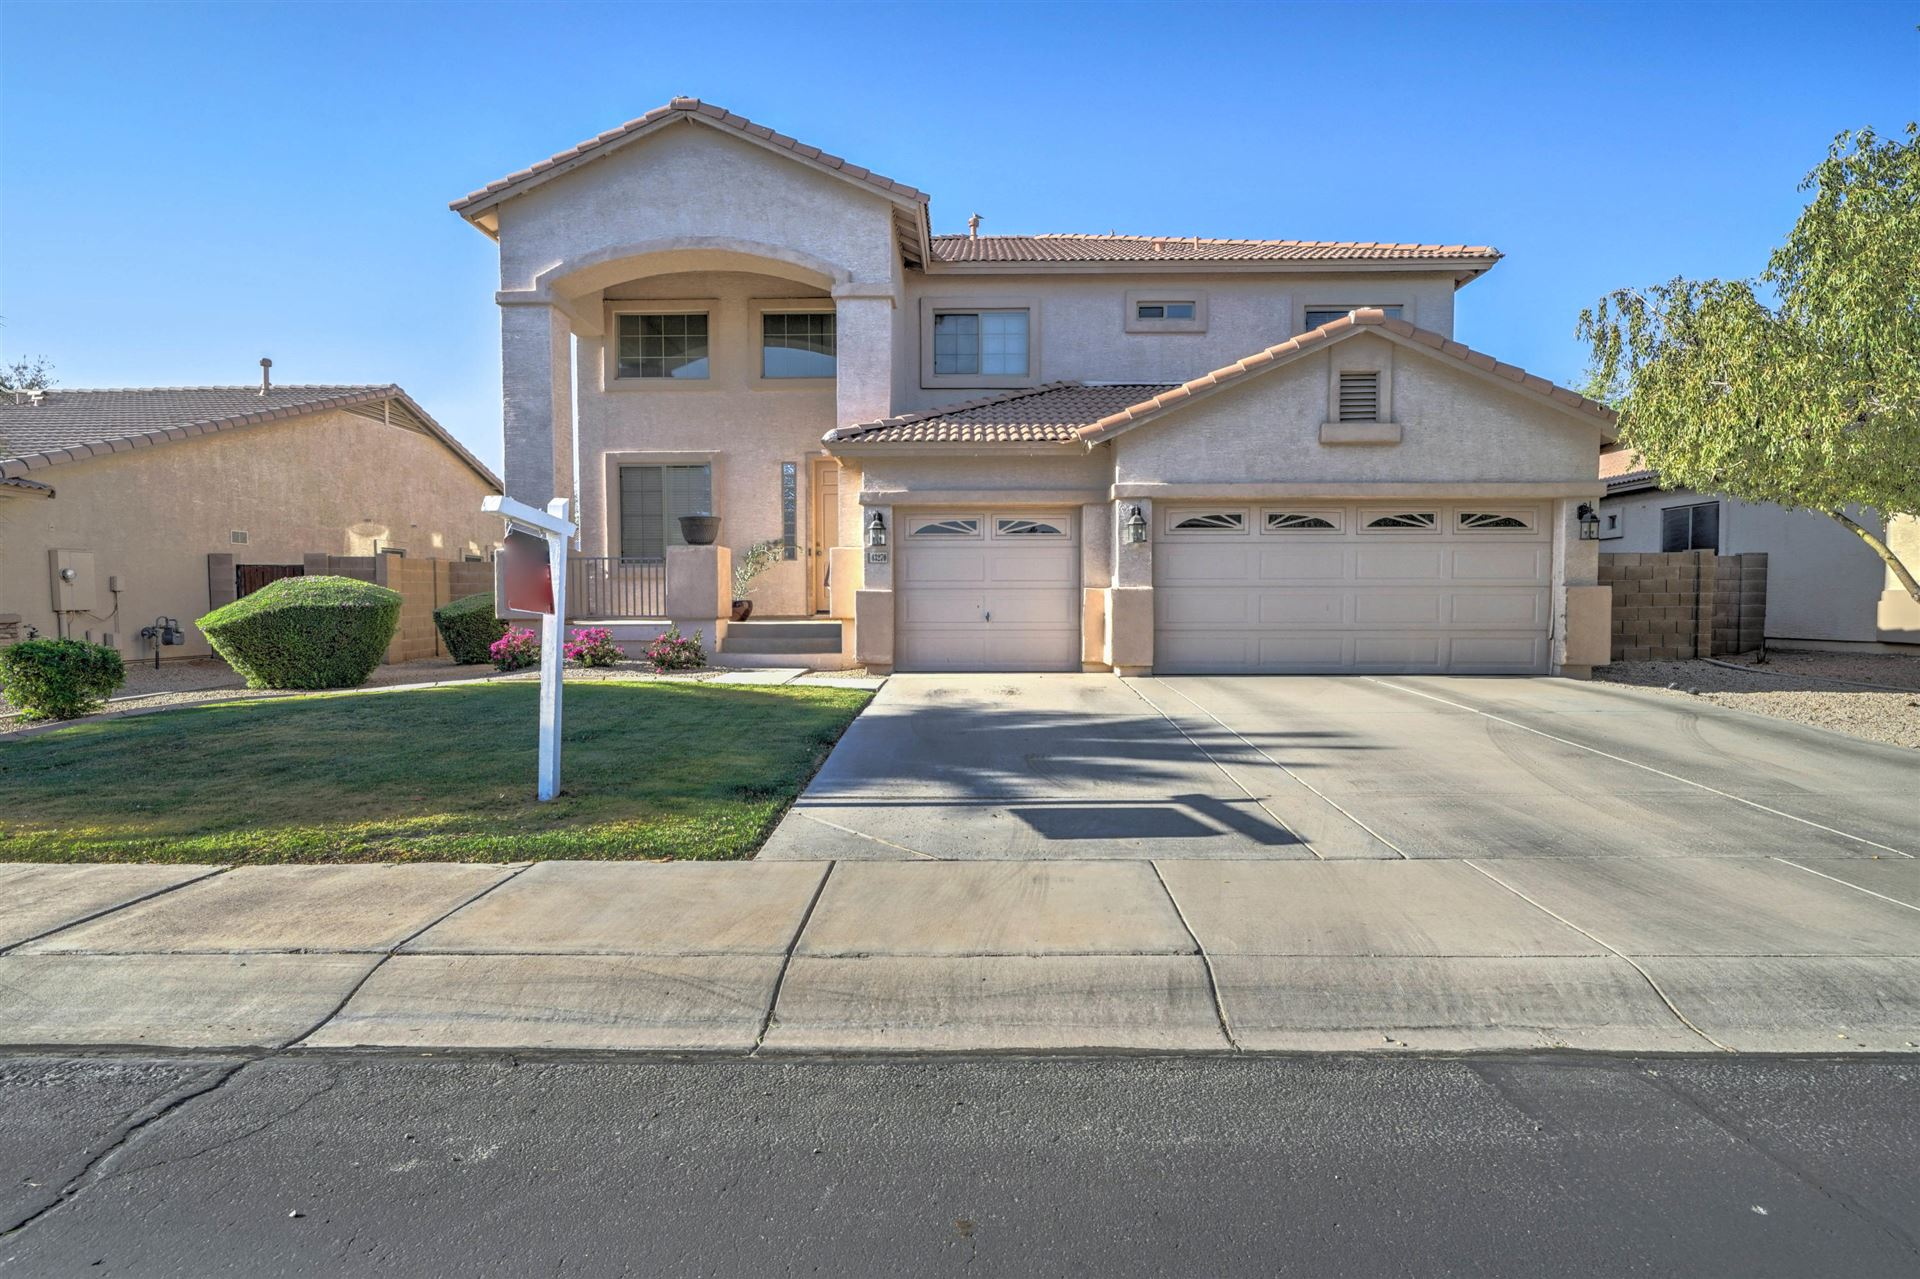 43270 W CYDNEE Drive, Maricopa, AZ 85138 - MLS#: 6225838